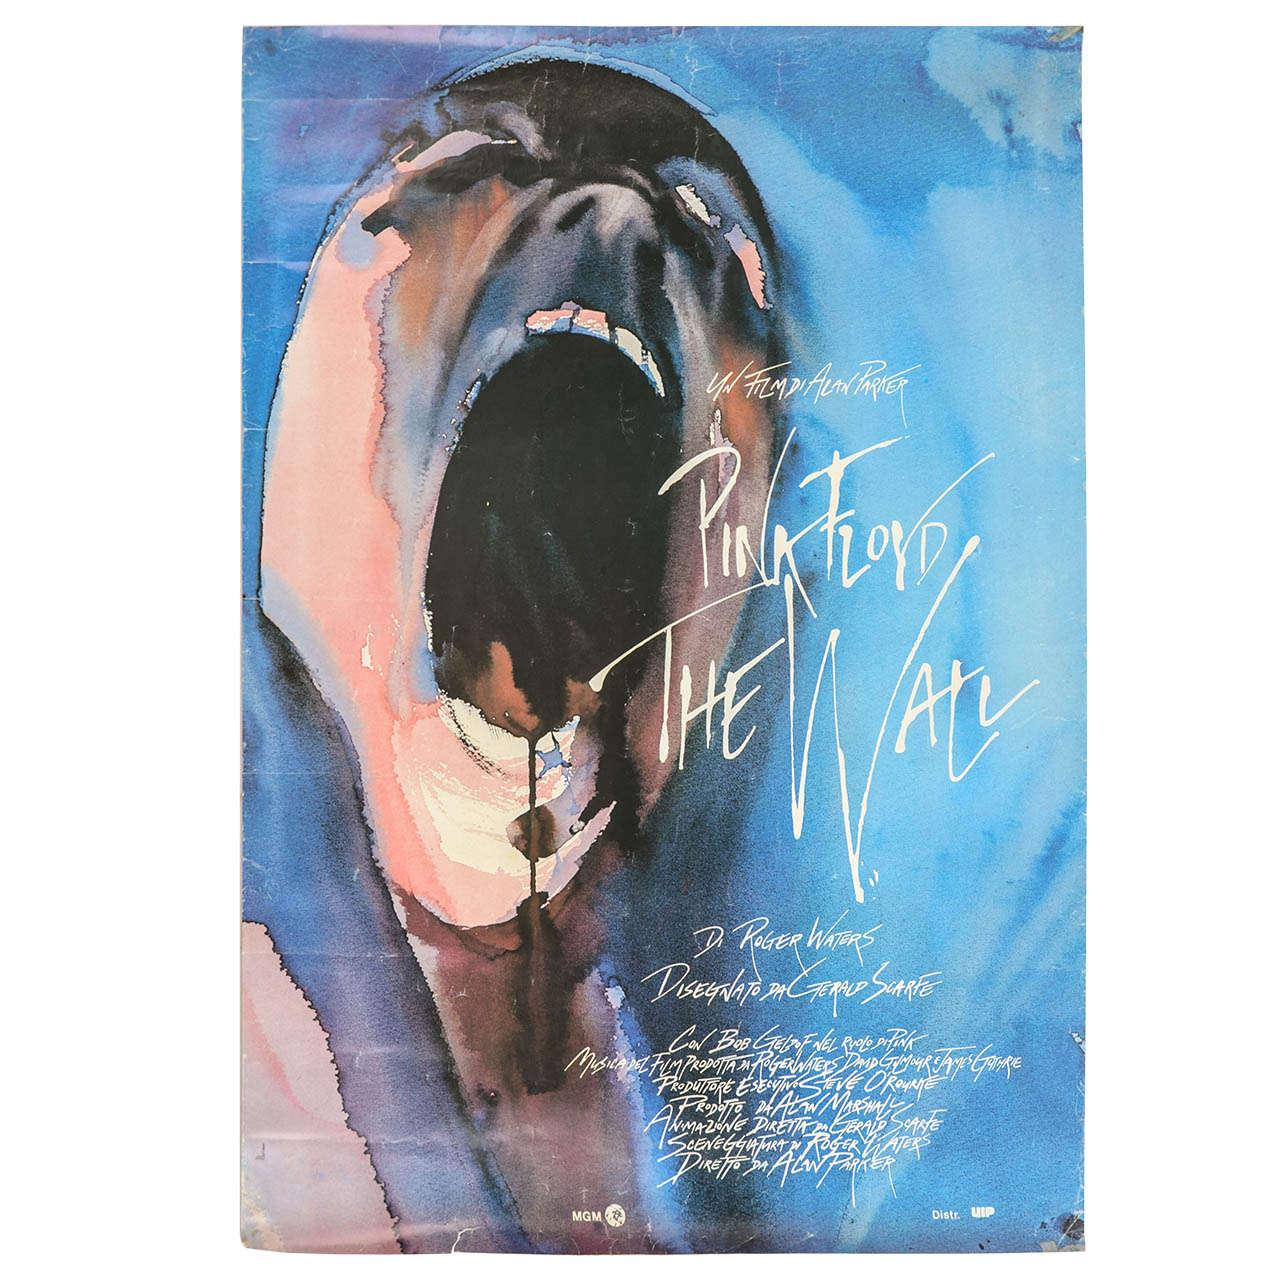 Original Film Poster for, u0026quot;Pink Floyd the Wallu0026quot; at 1stdibs